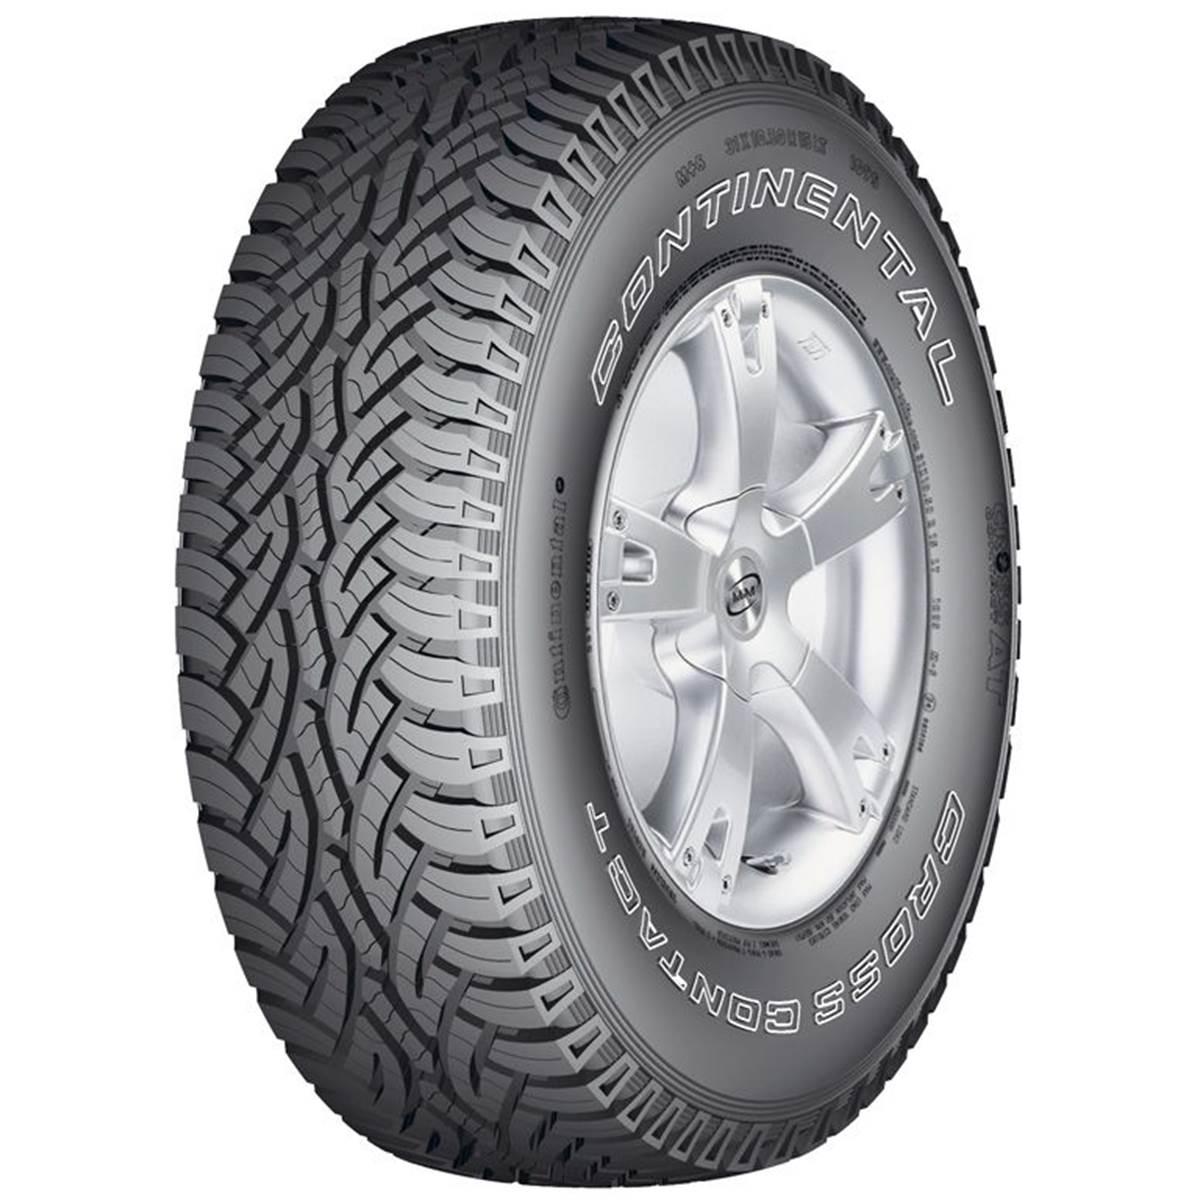 achat pneu continental conti crosscontact at 205 70 r15 96t pas cher. Black Bedroom Furniture Sets. Home Design Ideas